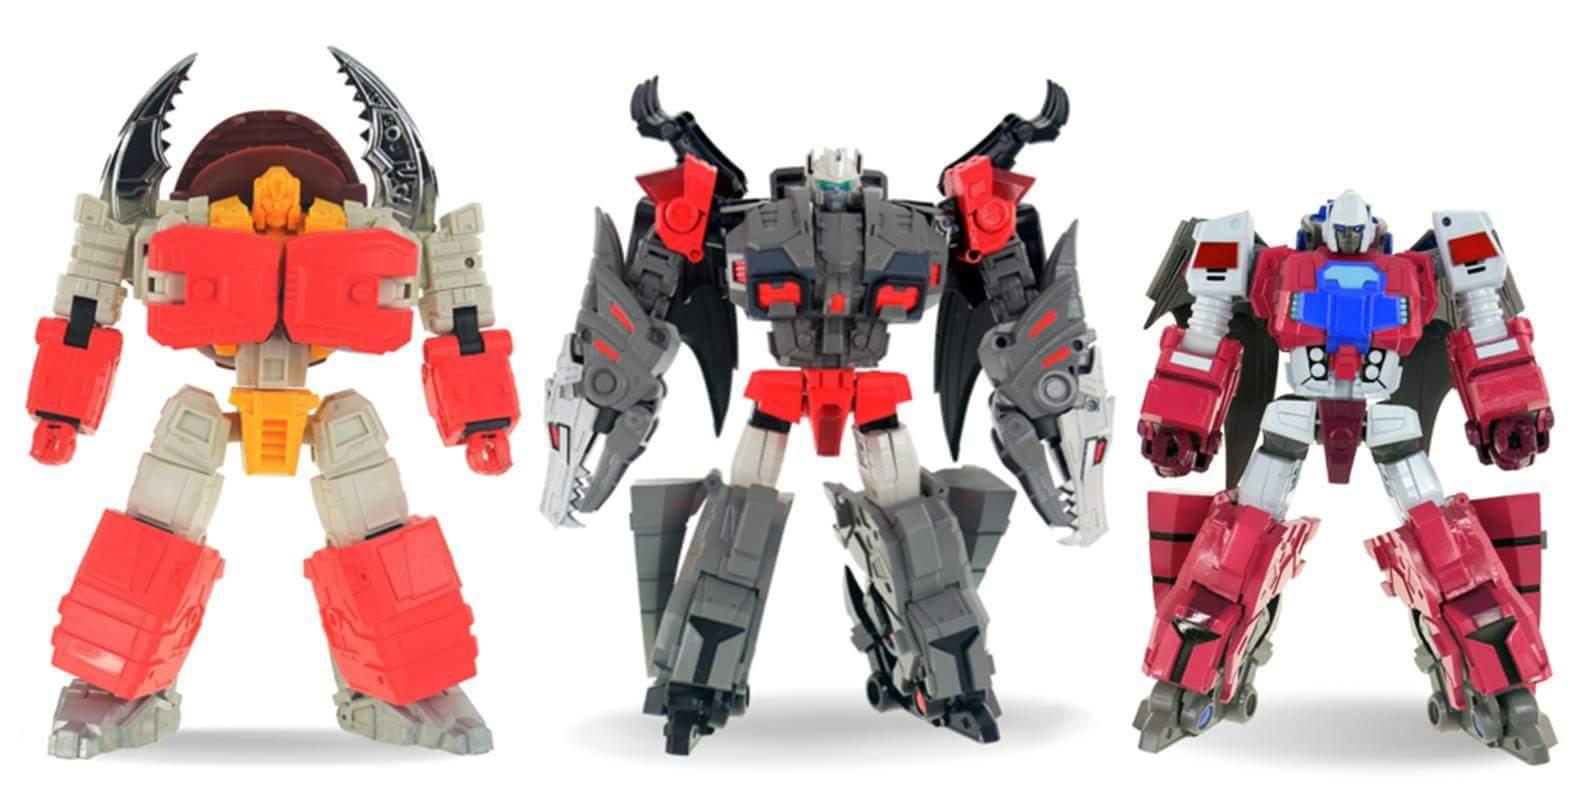 [FansHobby] Produit Tiers - Master Builder MB-02/03/05 - aka Monsterbots/Monstrebots FbZr8SlM